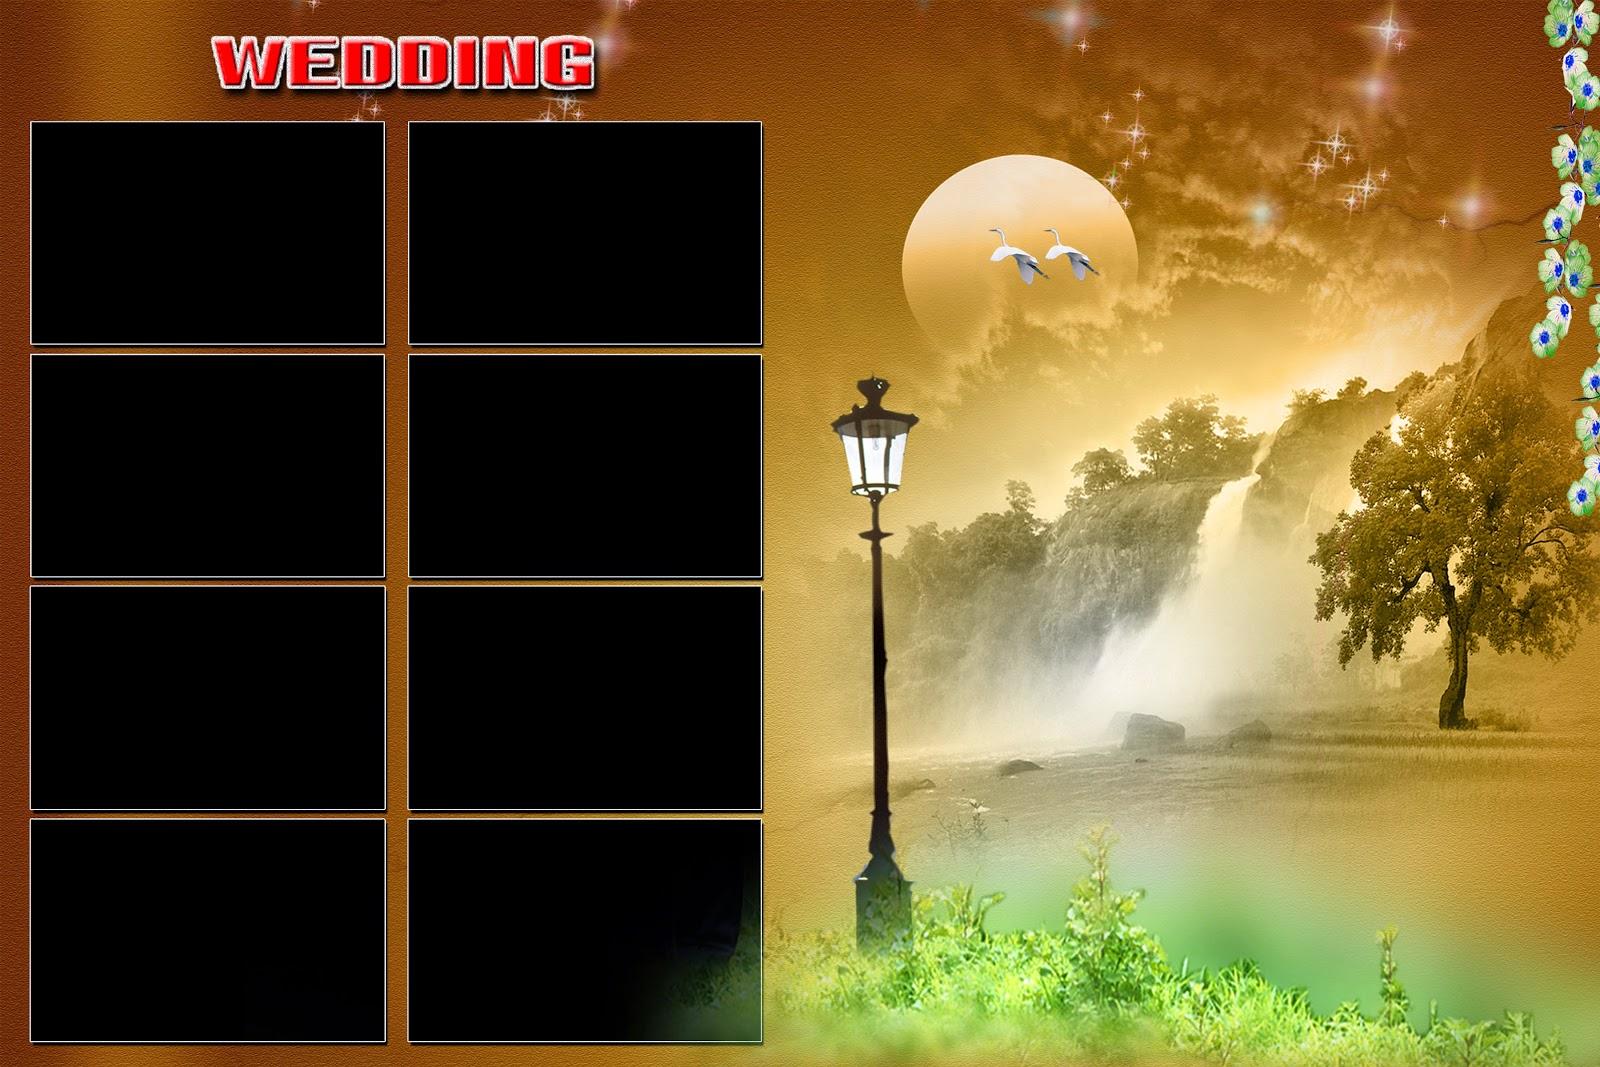 Karizma Album Background 12x18 | Joy Studio Design Gallery ... Karizma Wedding Album Software Free Download